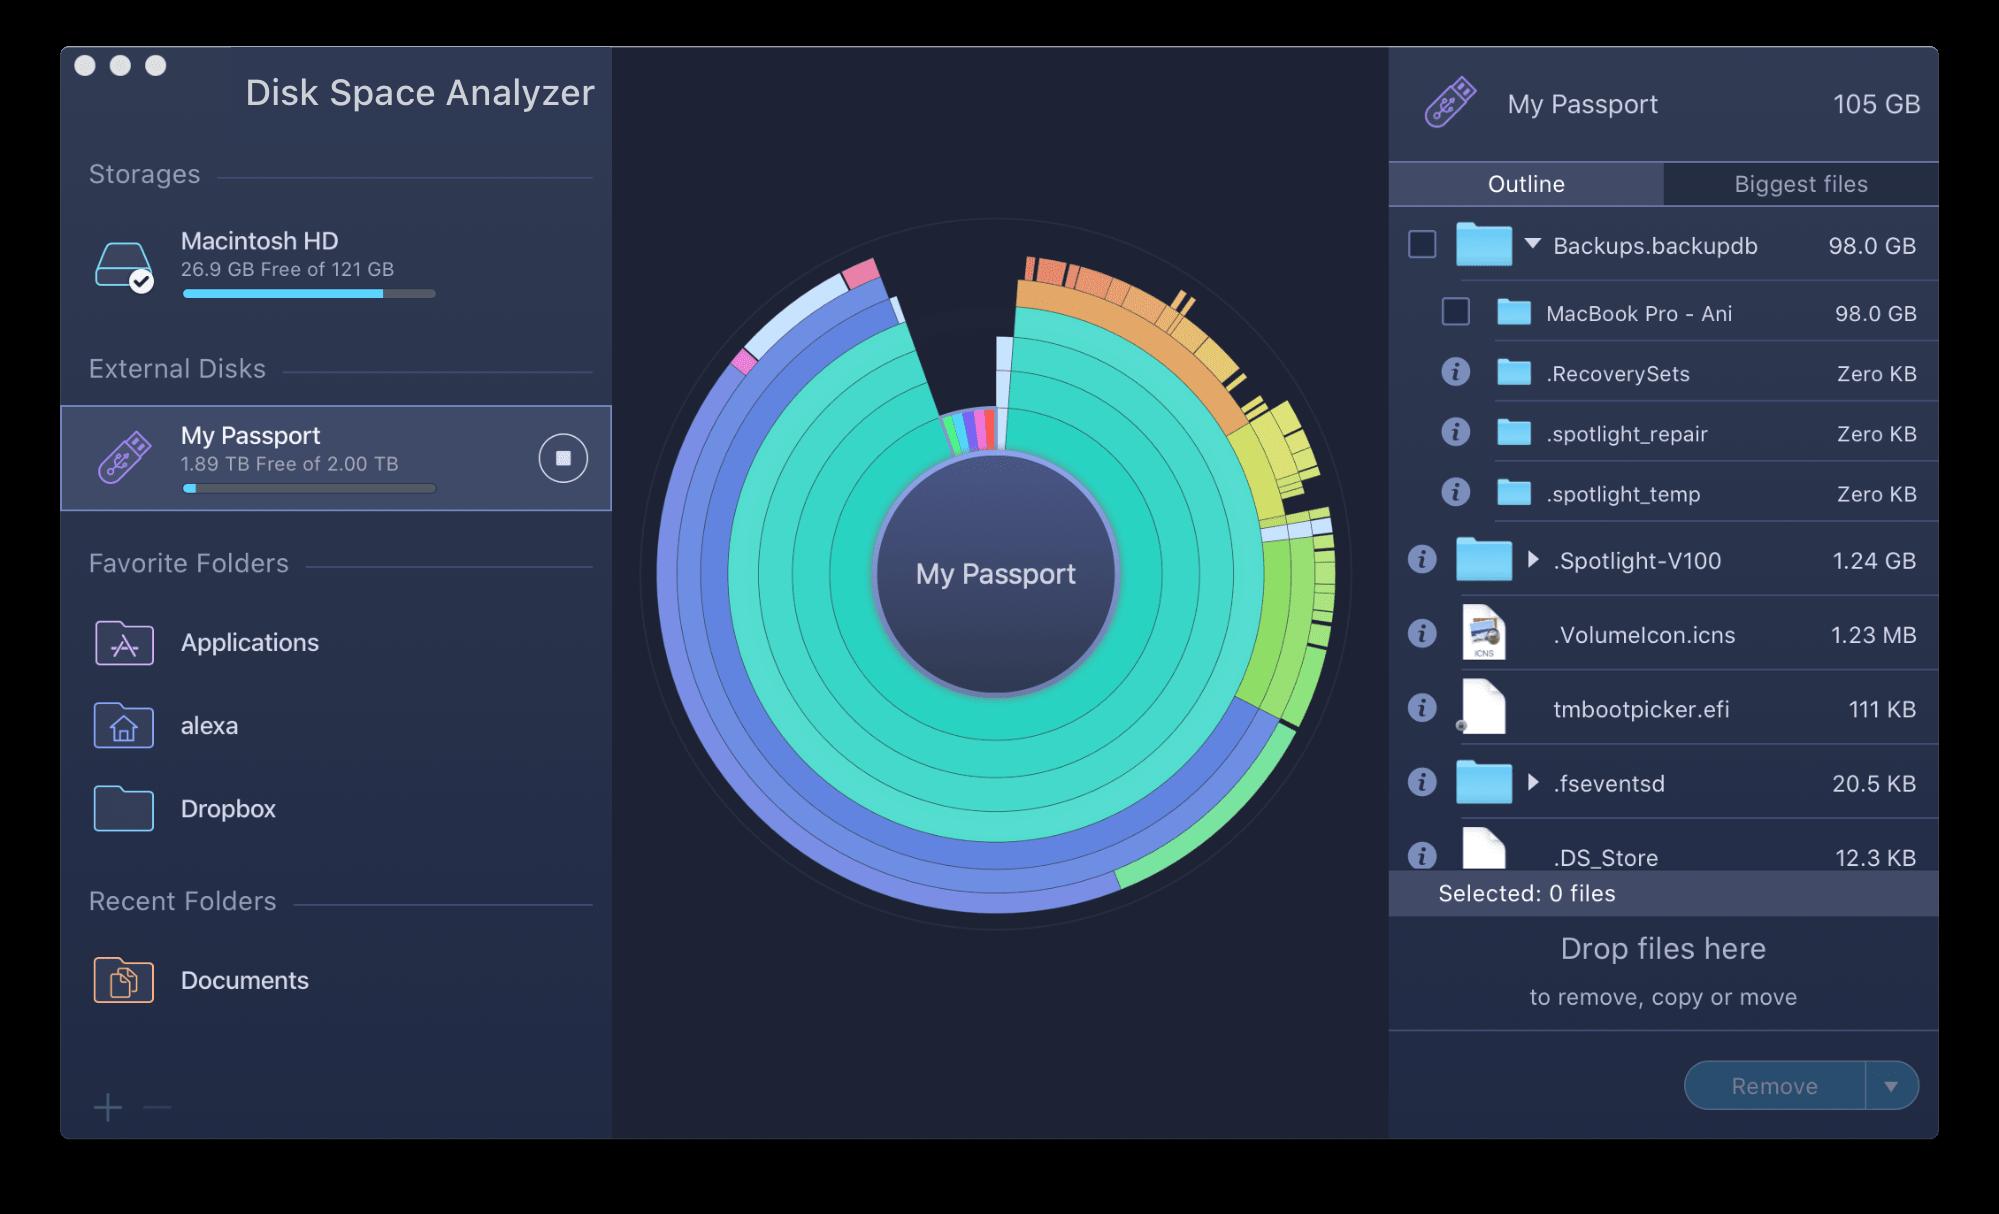 disk space analyzer window showing external storage usage